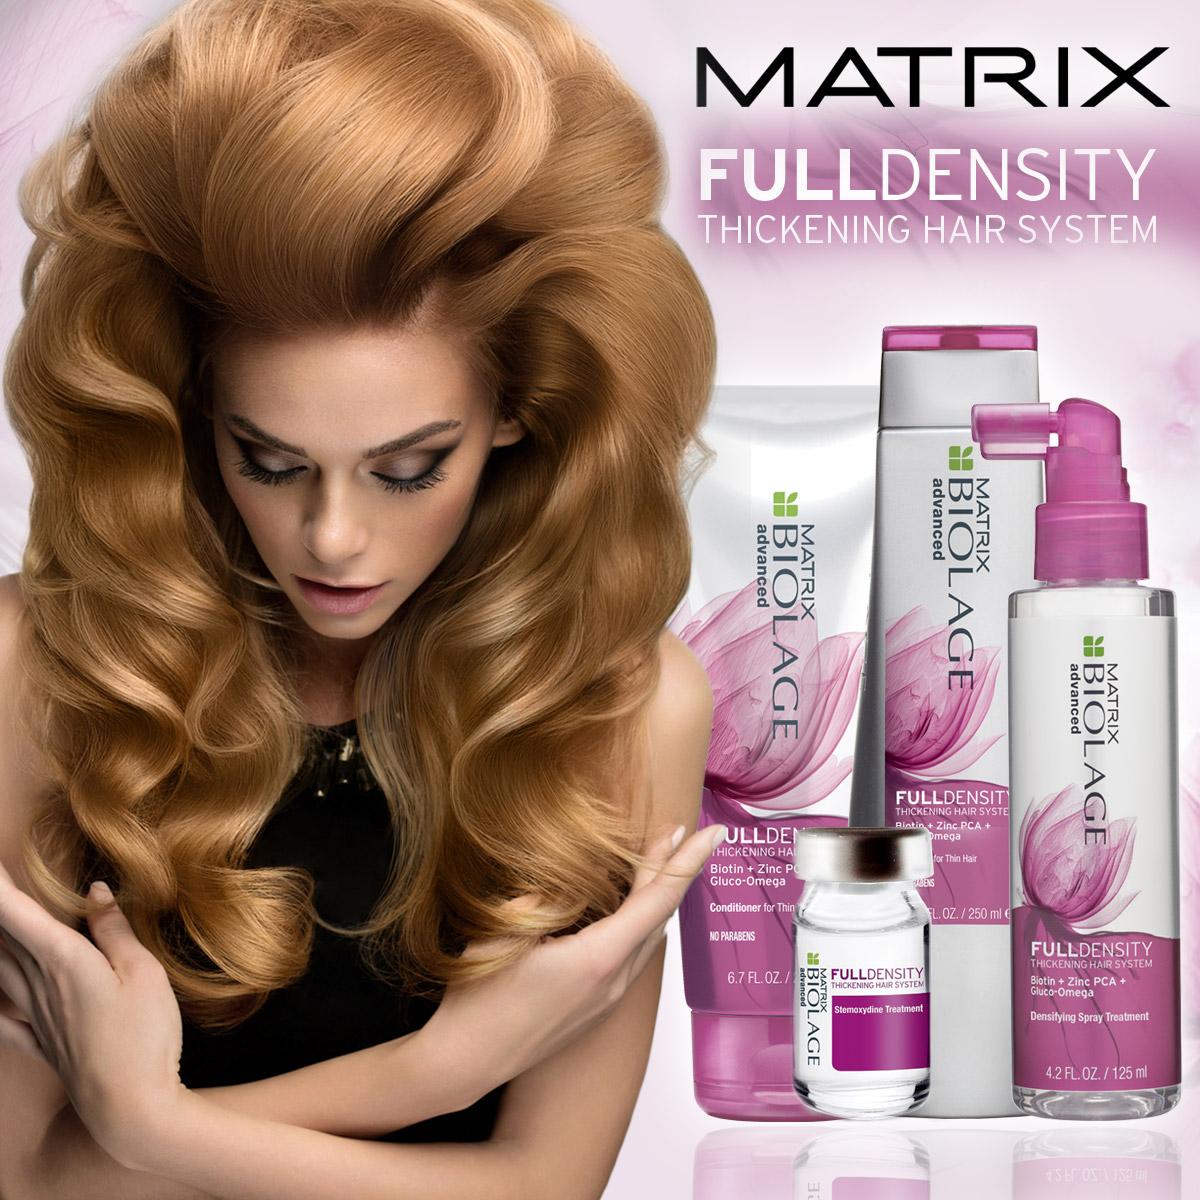 Сбор заказов. Уход за волосами M@trix-128. Лучшей цены не найти. Стоп 7 марта.Раздачи через все ЦР